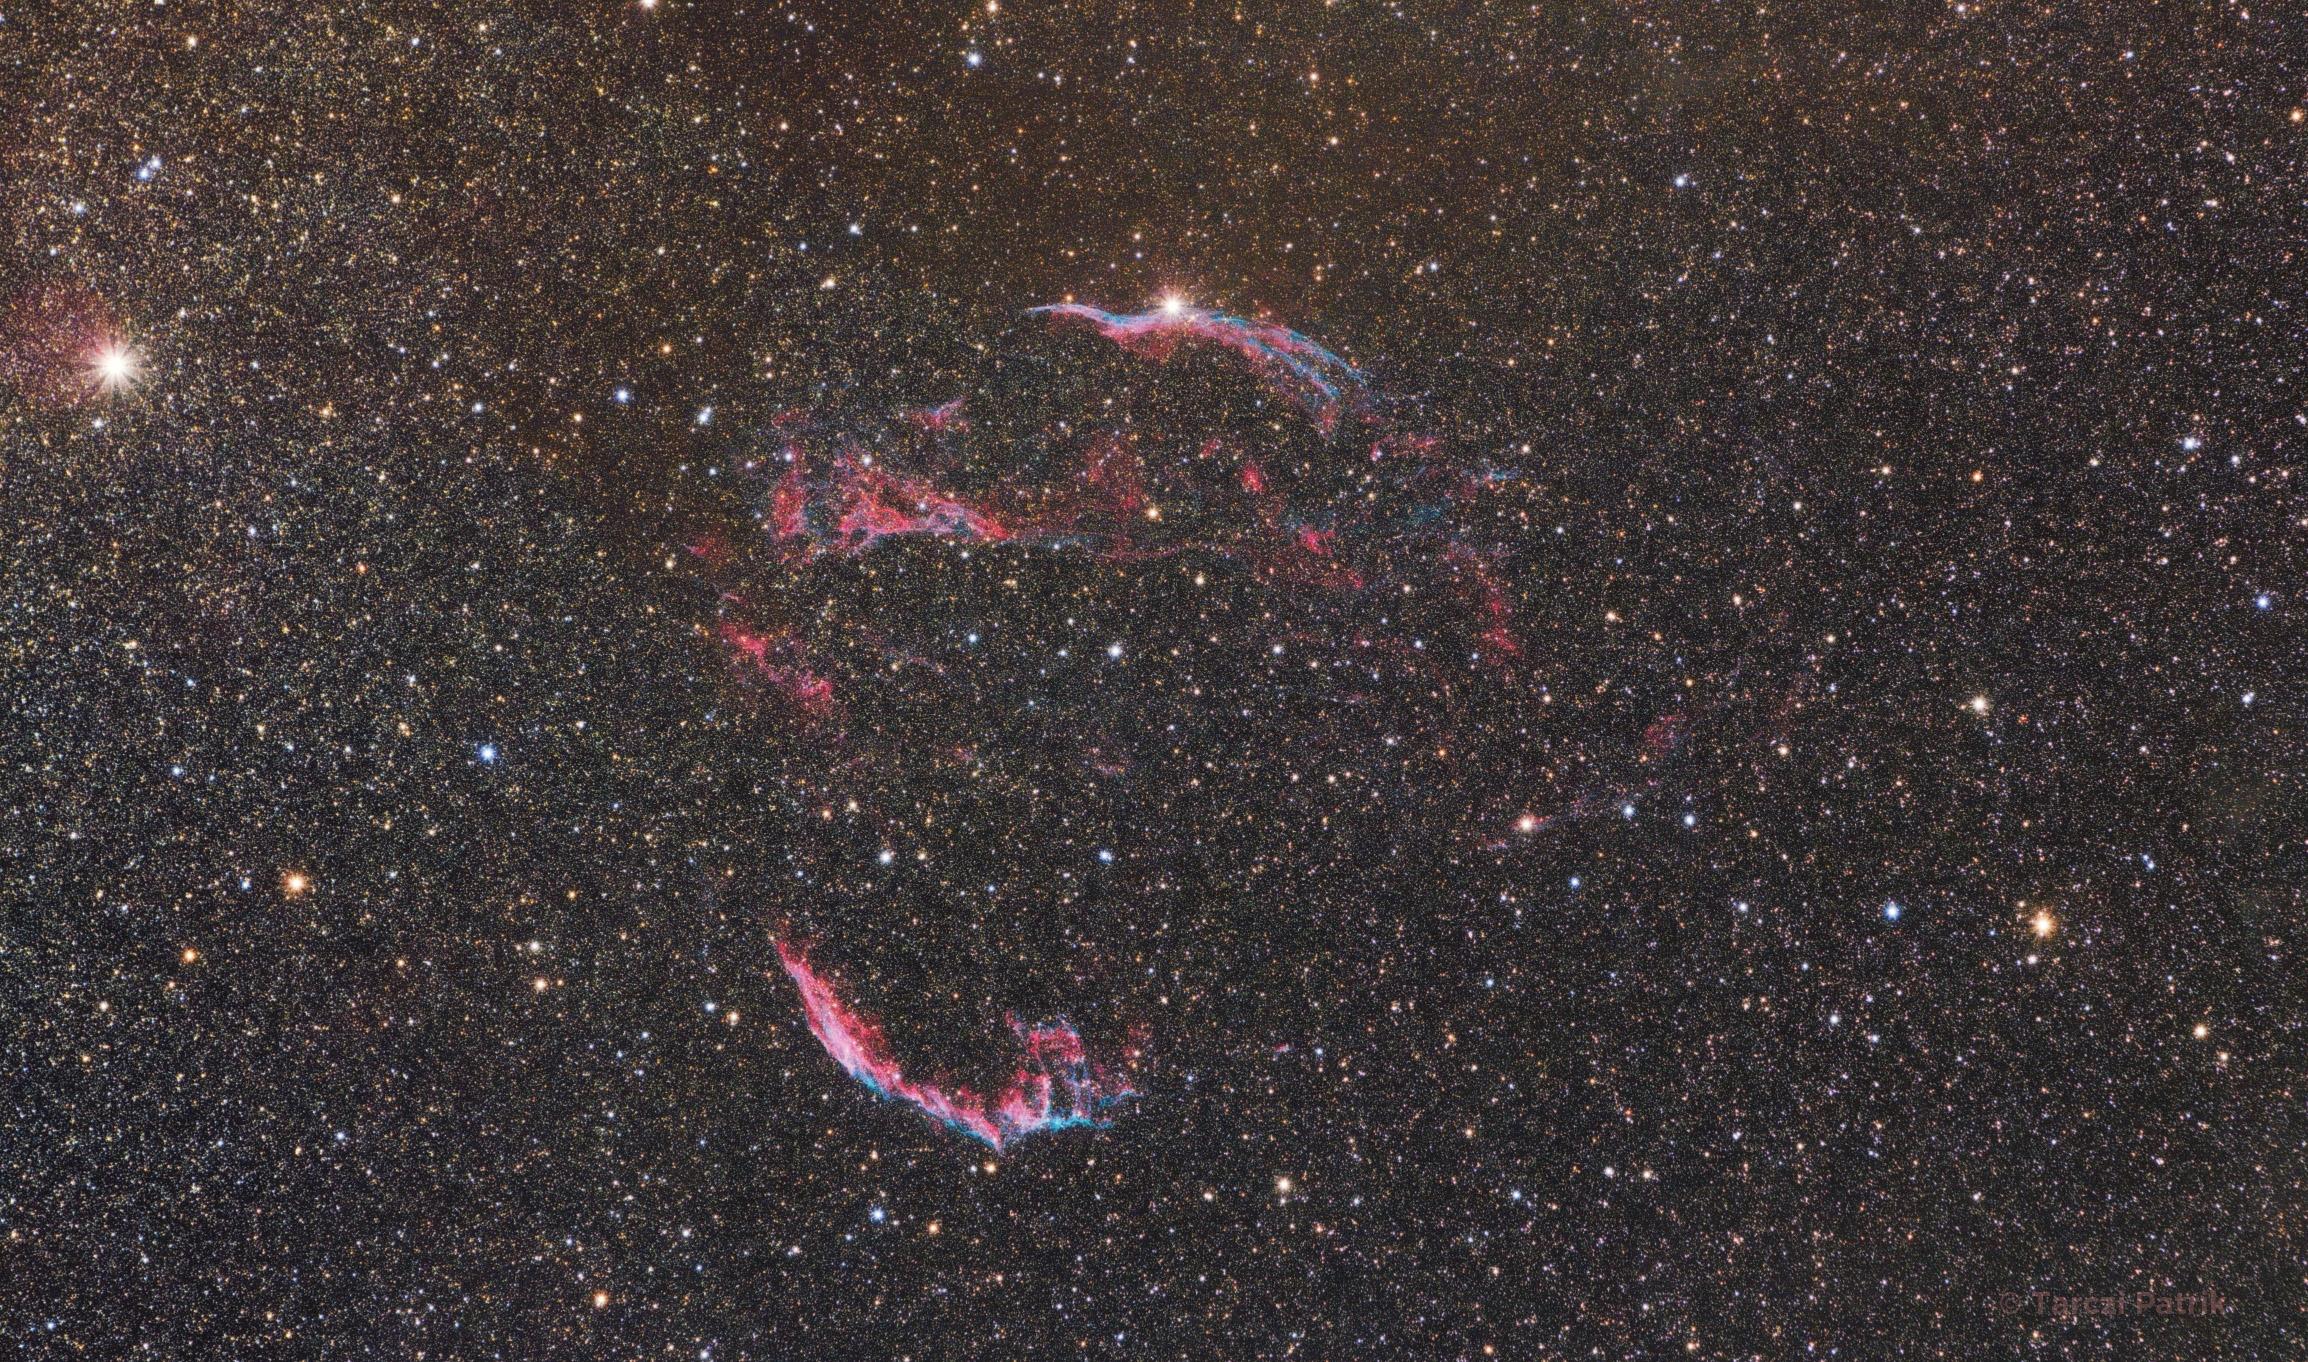 The complex of Veil Nebula